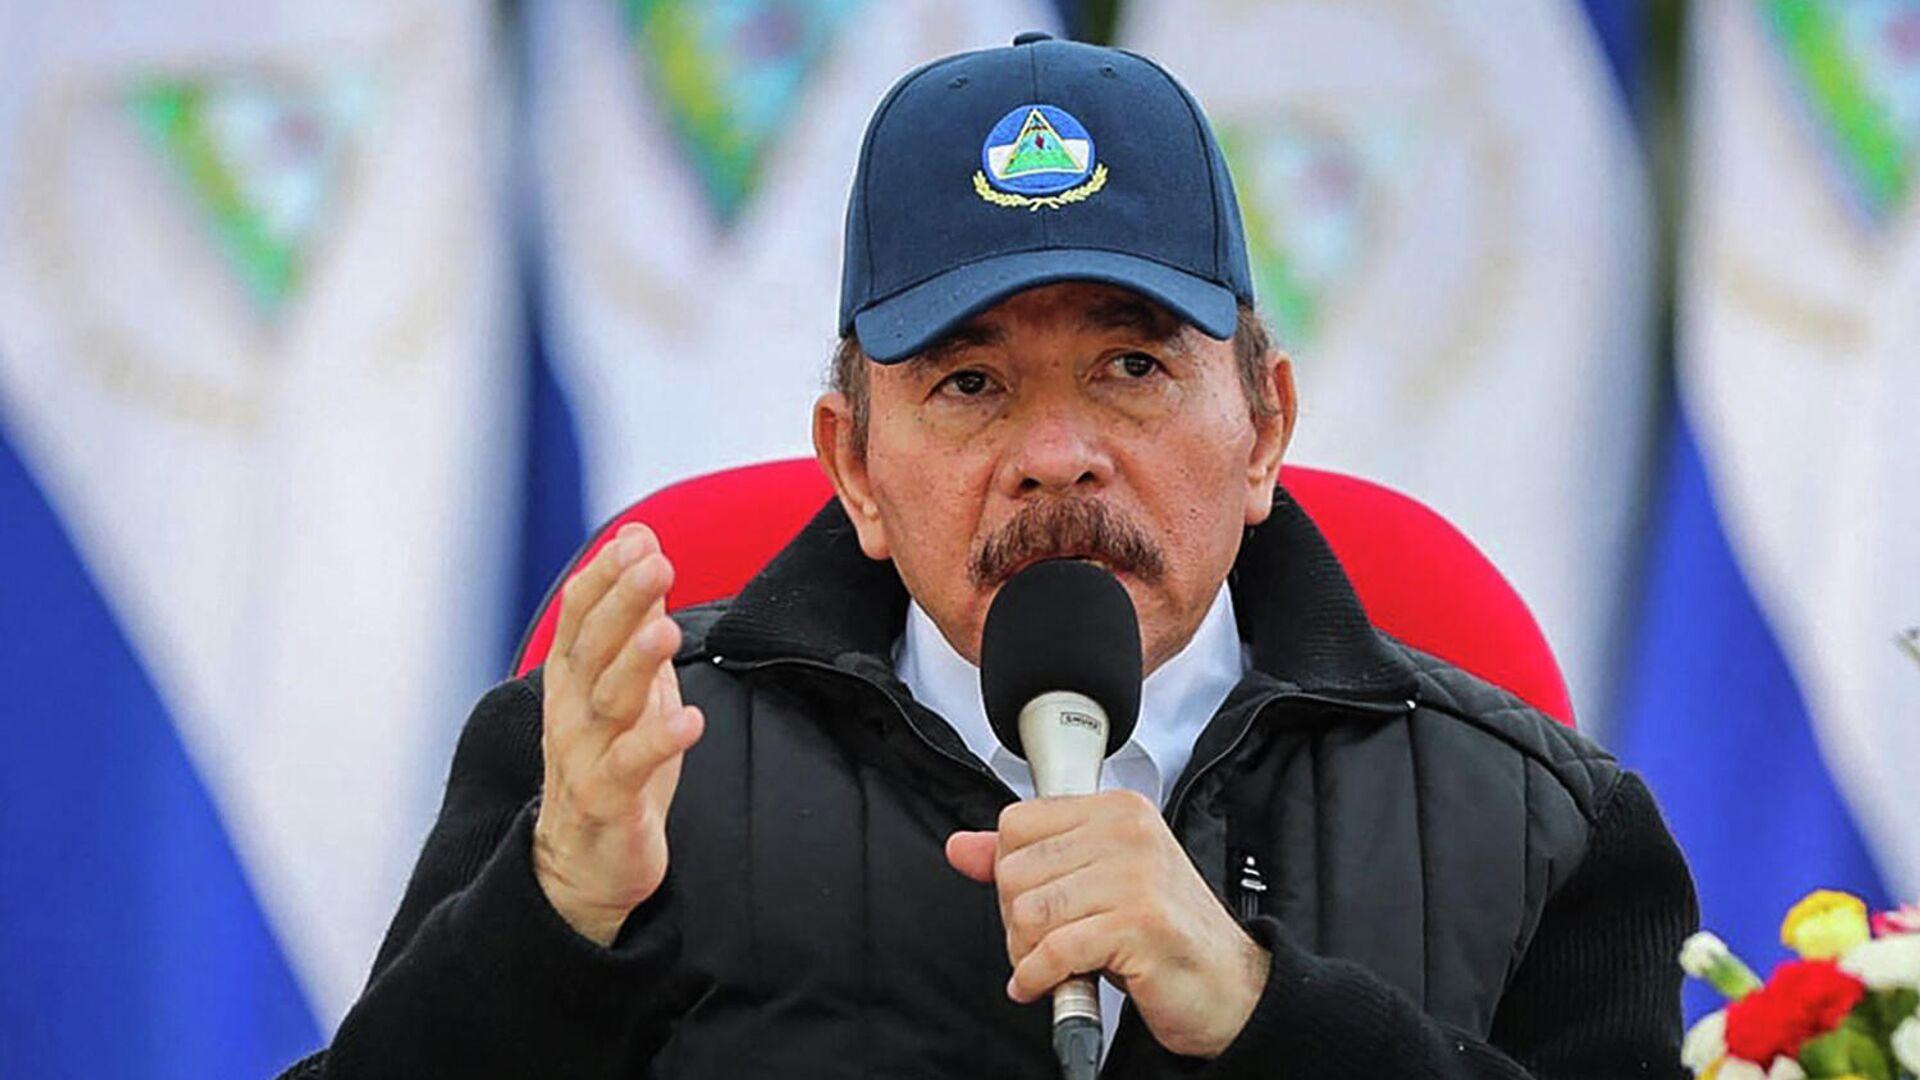 Daniel Ortega, presidente de Nicaragua - Sputnik Mundo, 1920, 23.02.2021